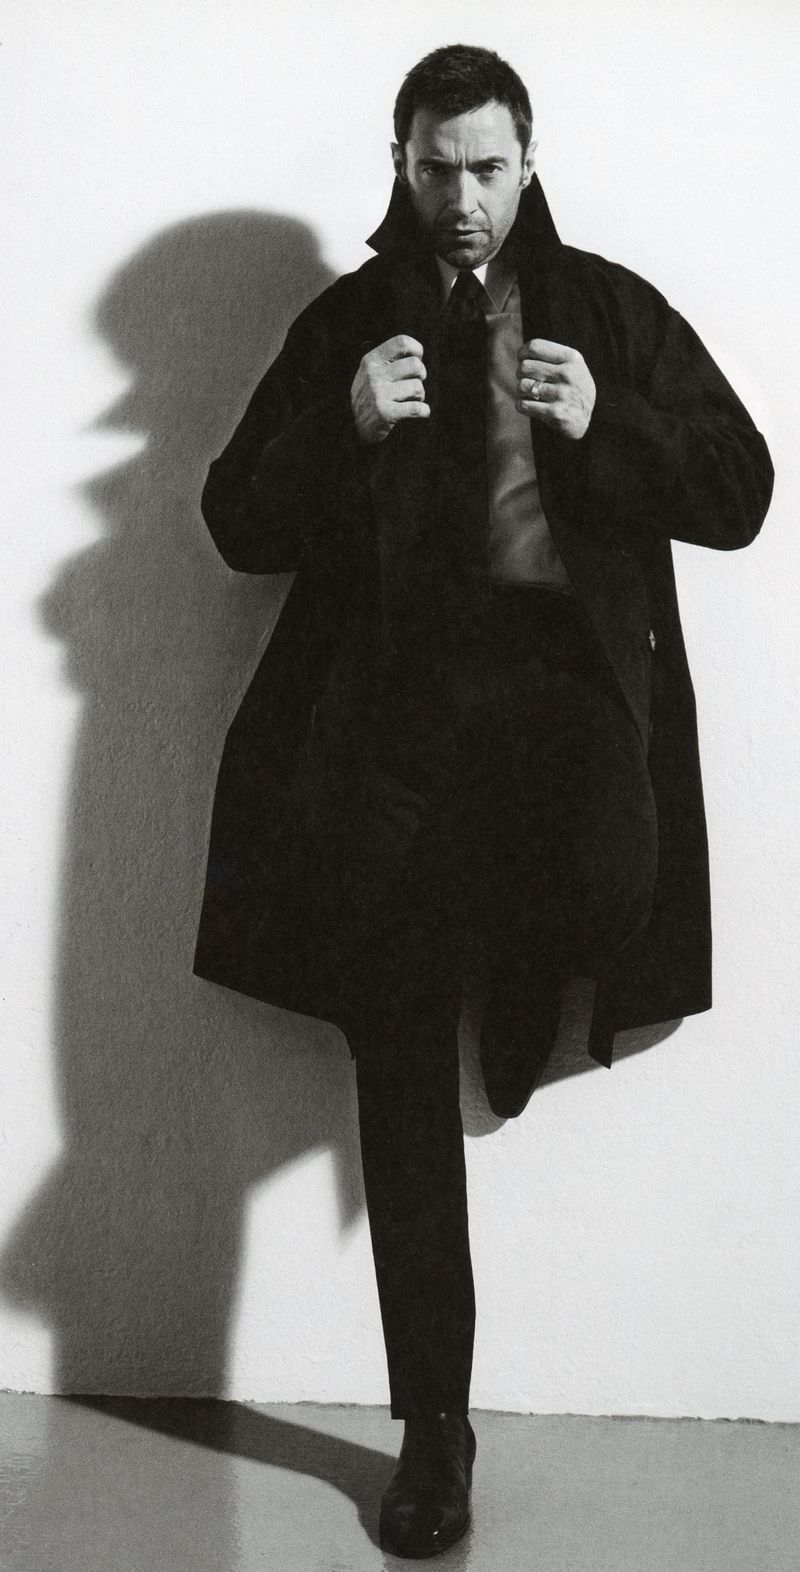 Hugh-Jackman-5